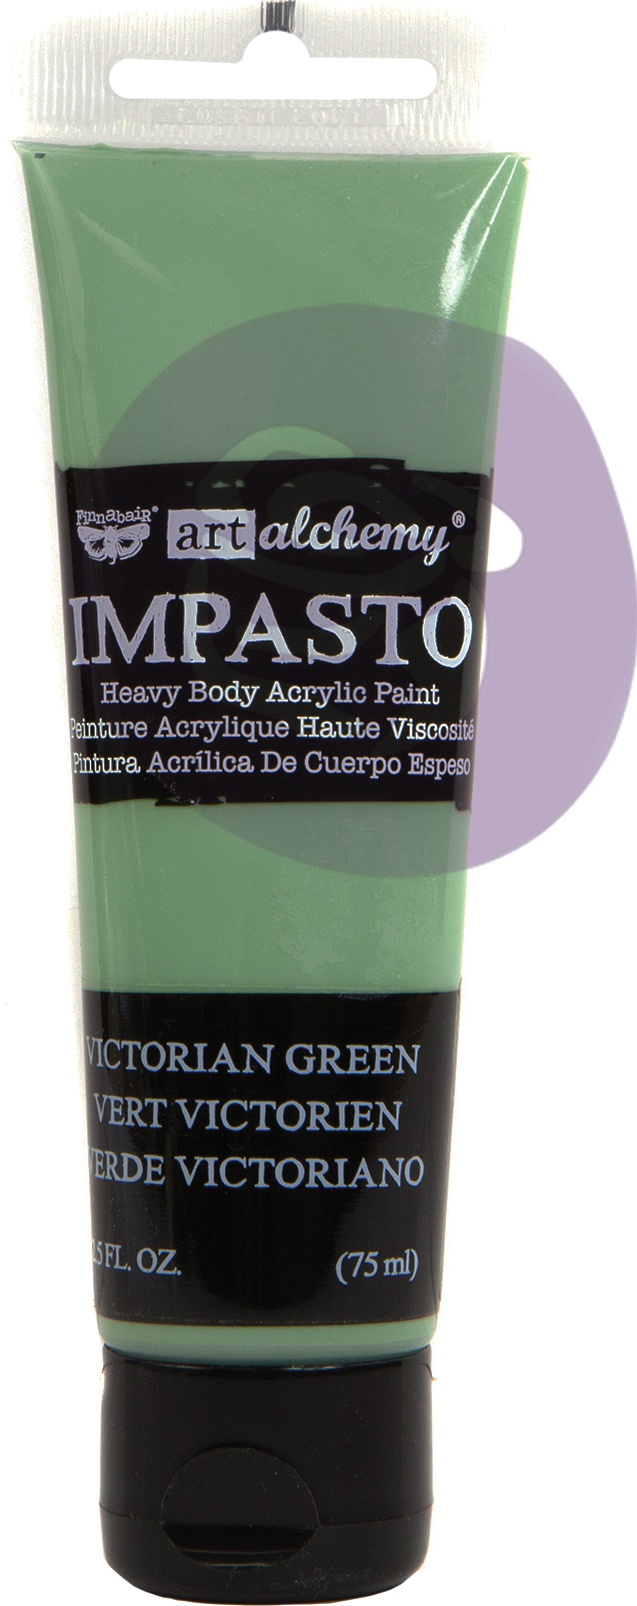 Finnabair Art Alchemy Impasto Paint 2.5 Fluid Ounces-Victorian Green